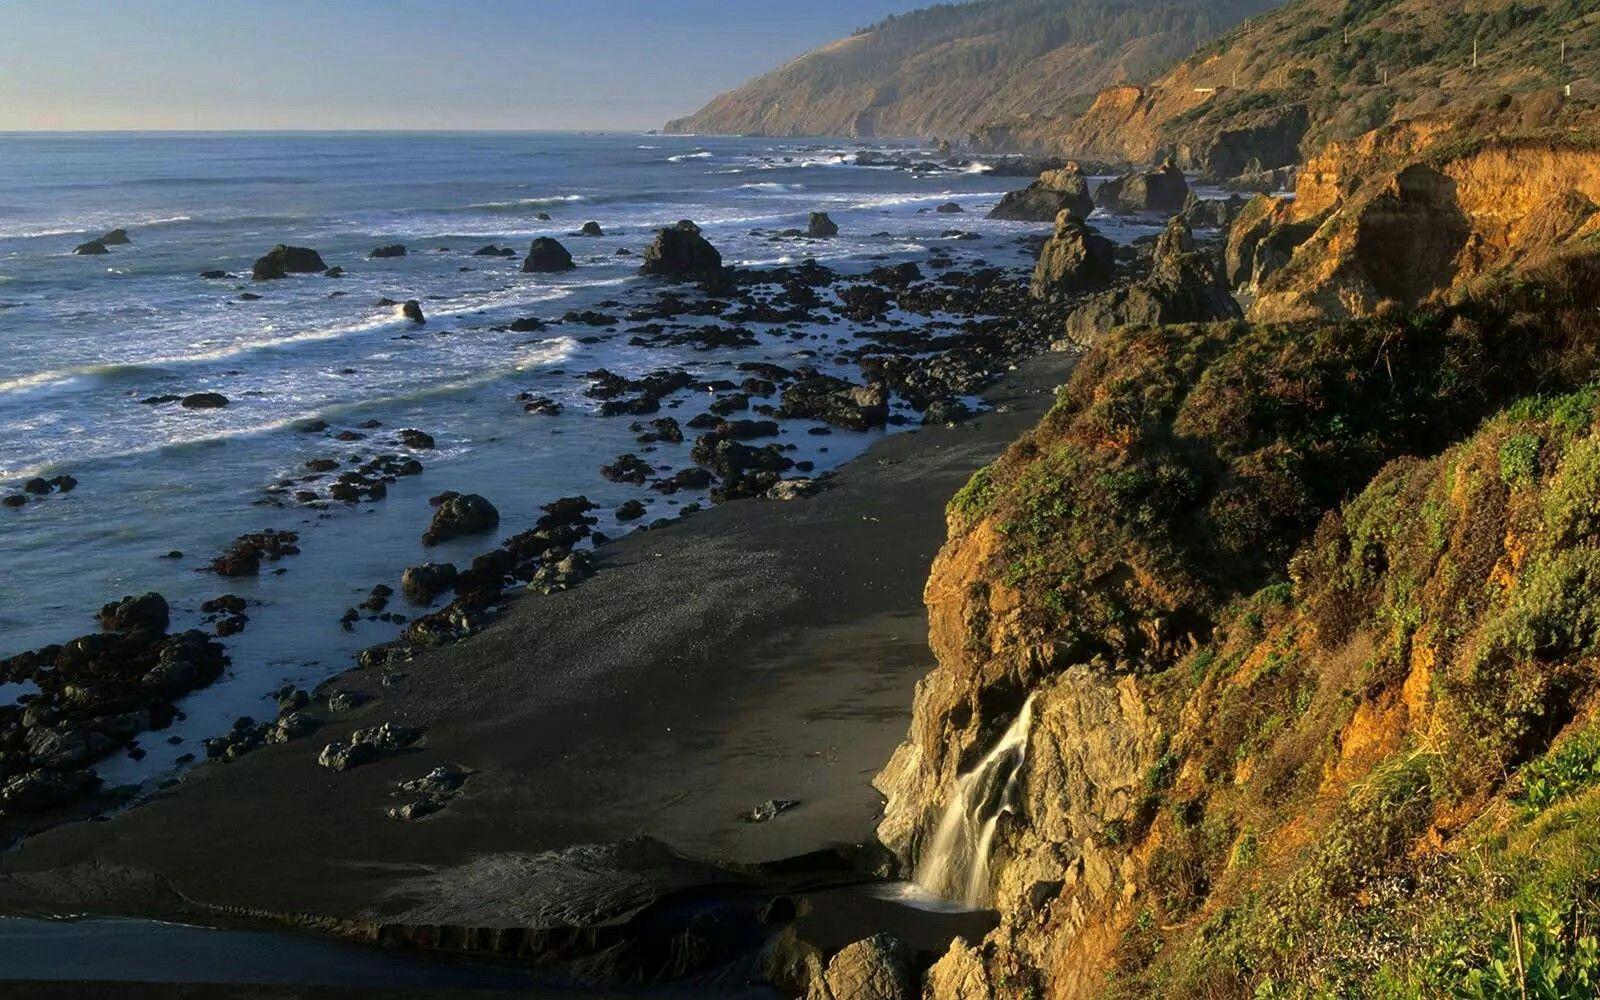 Beach Camping Ndocino Ca